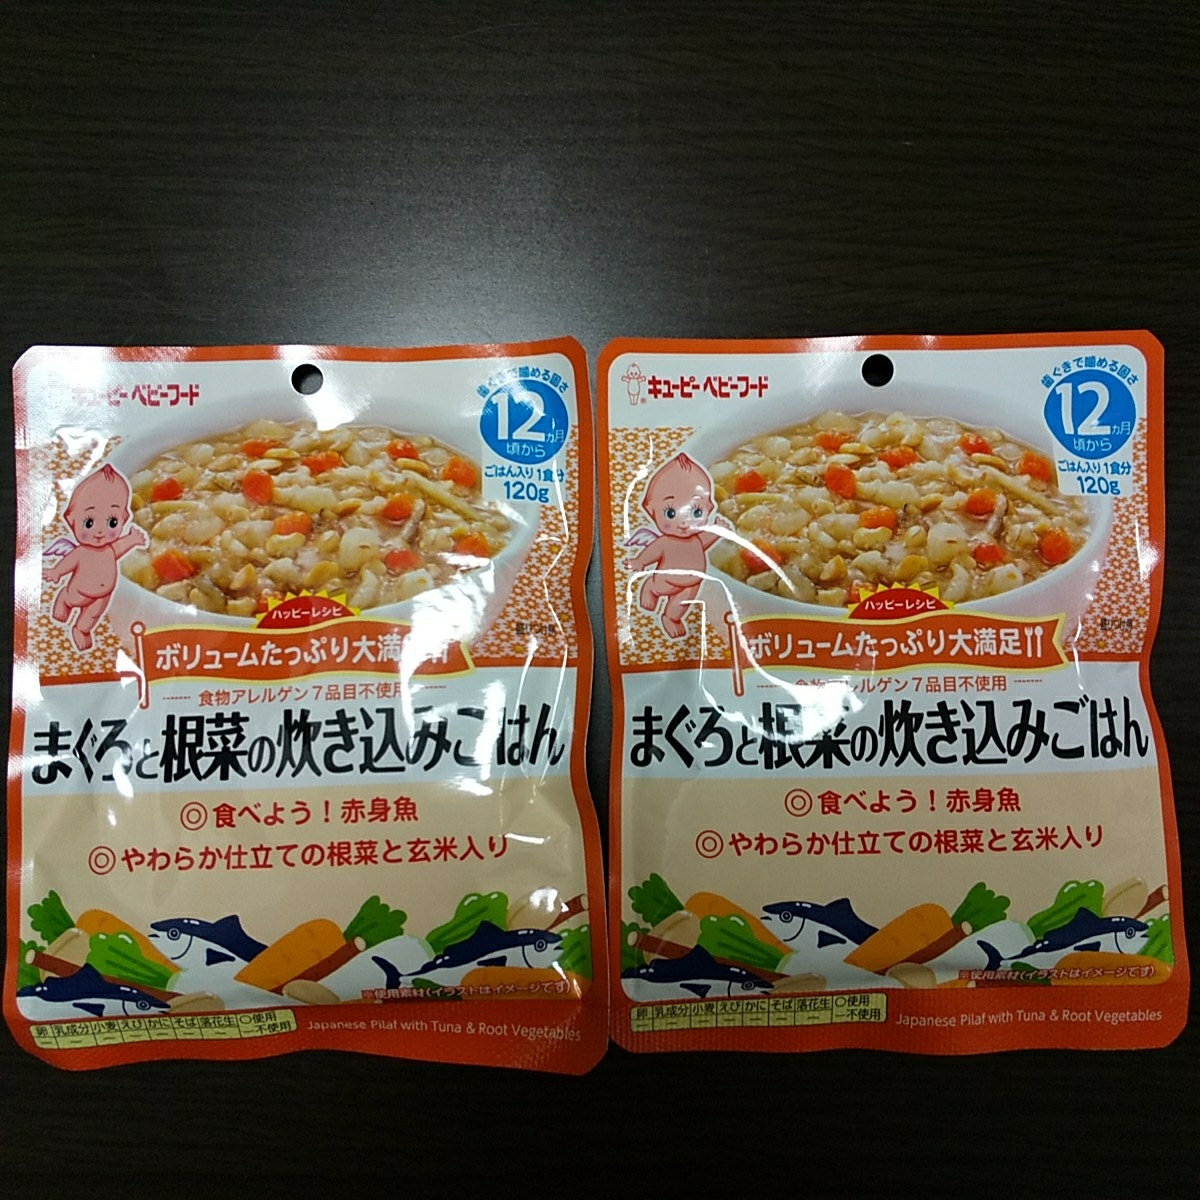 WAKODO 和光堂 キューピー ベビーフード 離乳食 レトルト_画像3